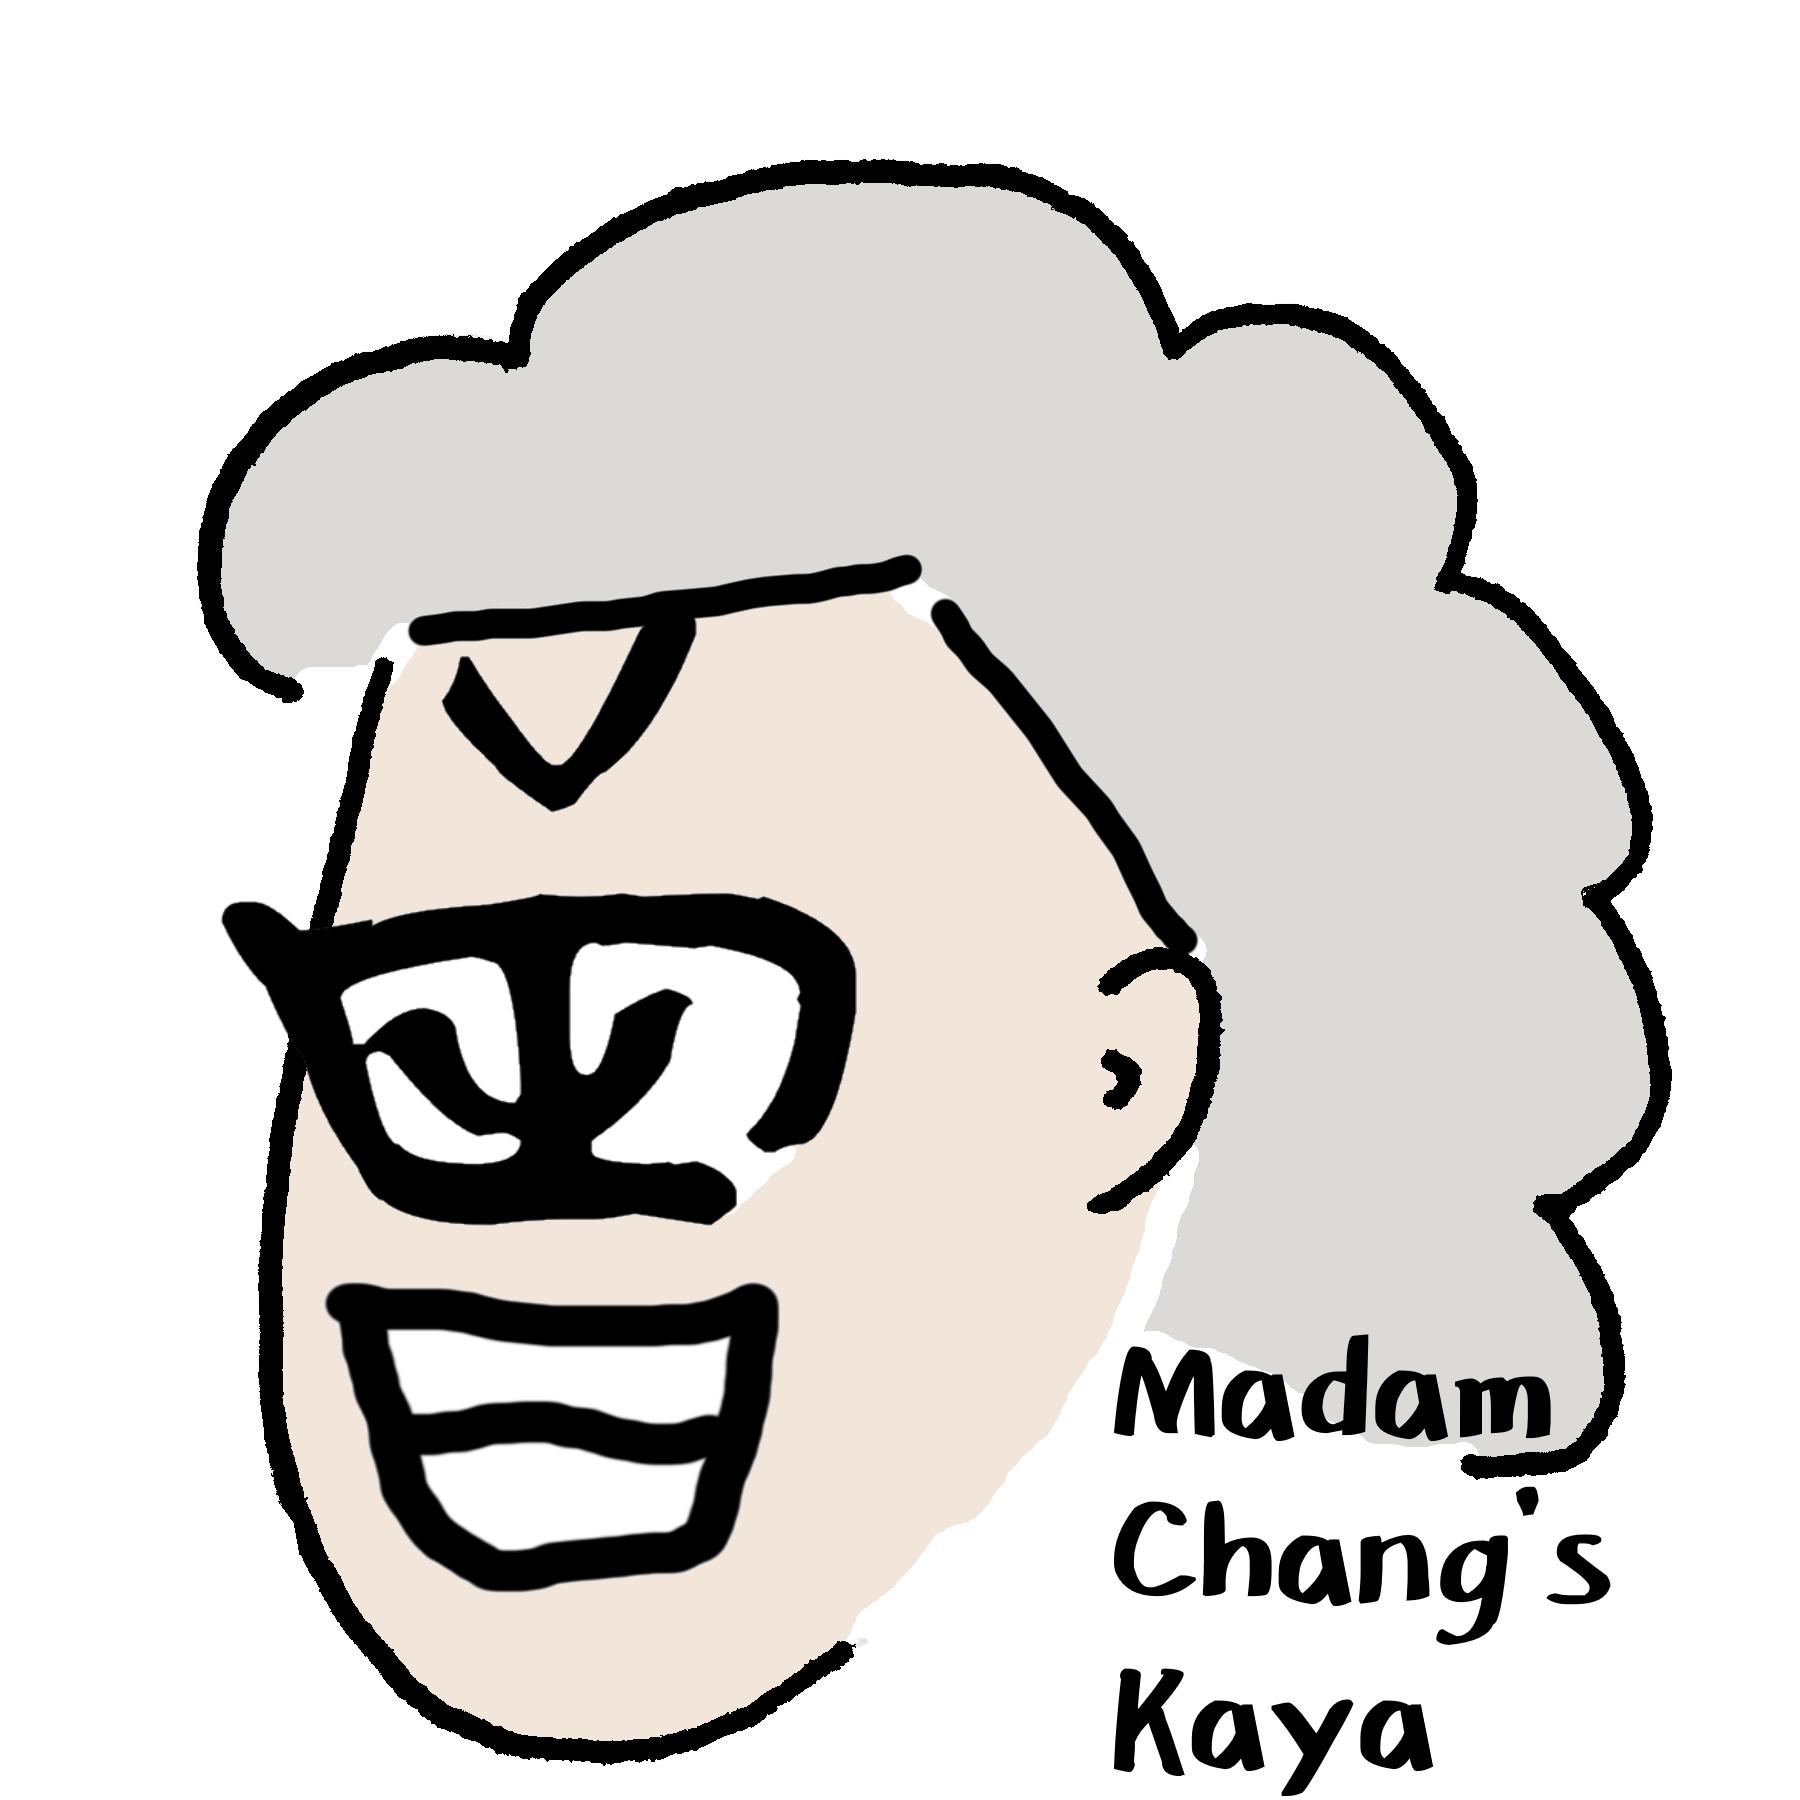 Madam Chang's Kaya